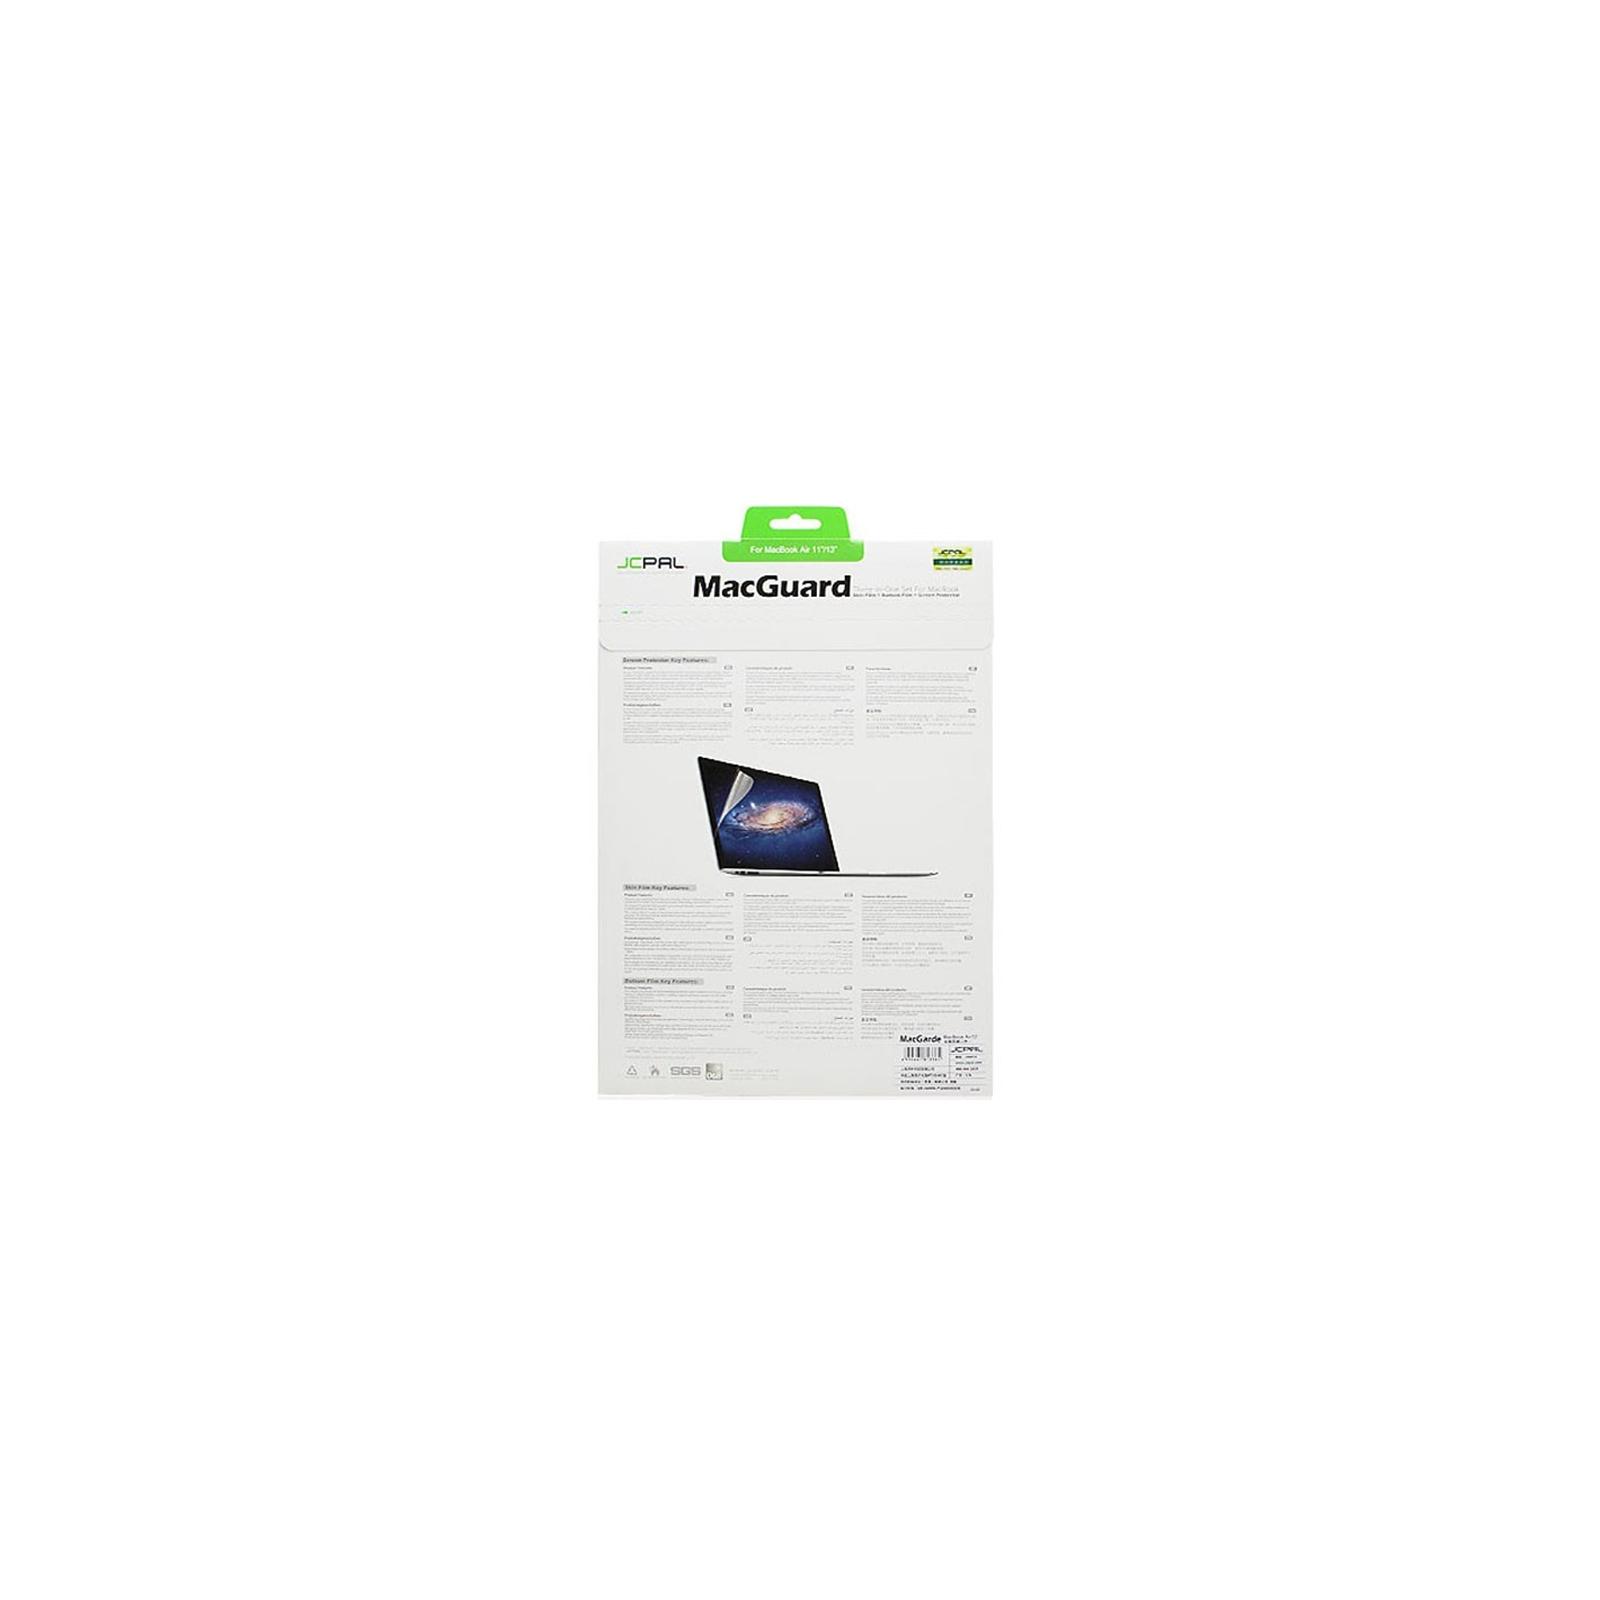 Пленка защитная JCPAL 3 in 1 set для MacBook Air 11 (JCP2043) изображение 2